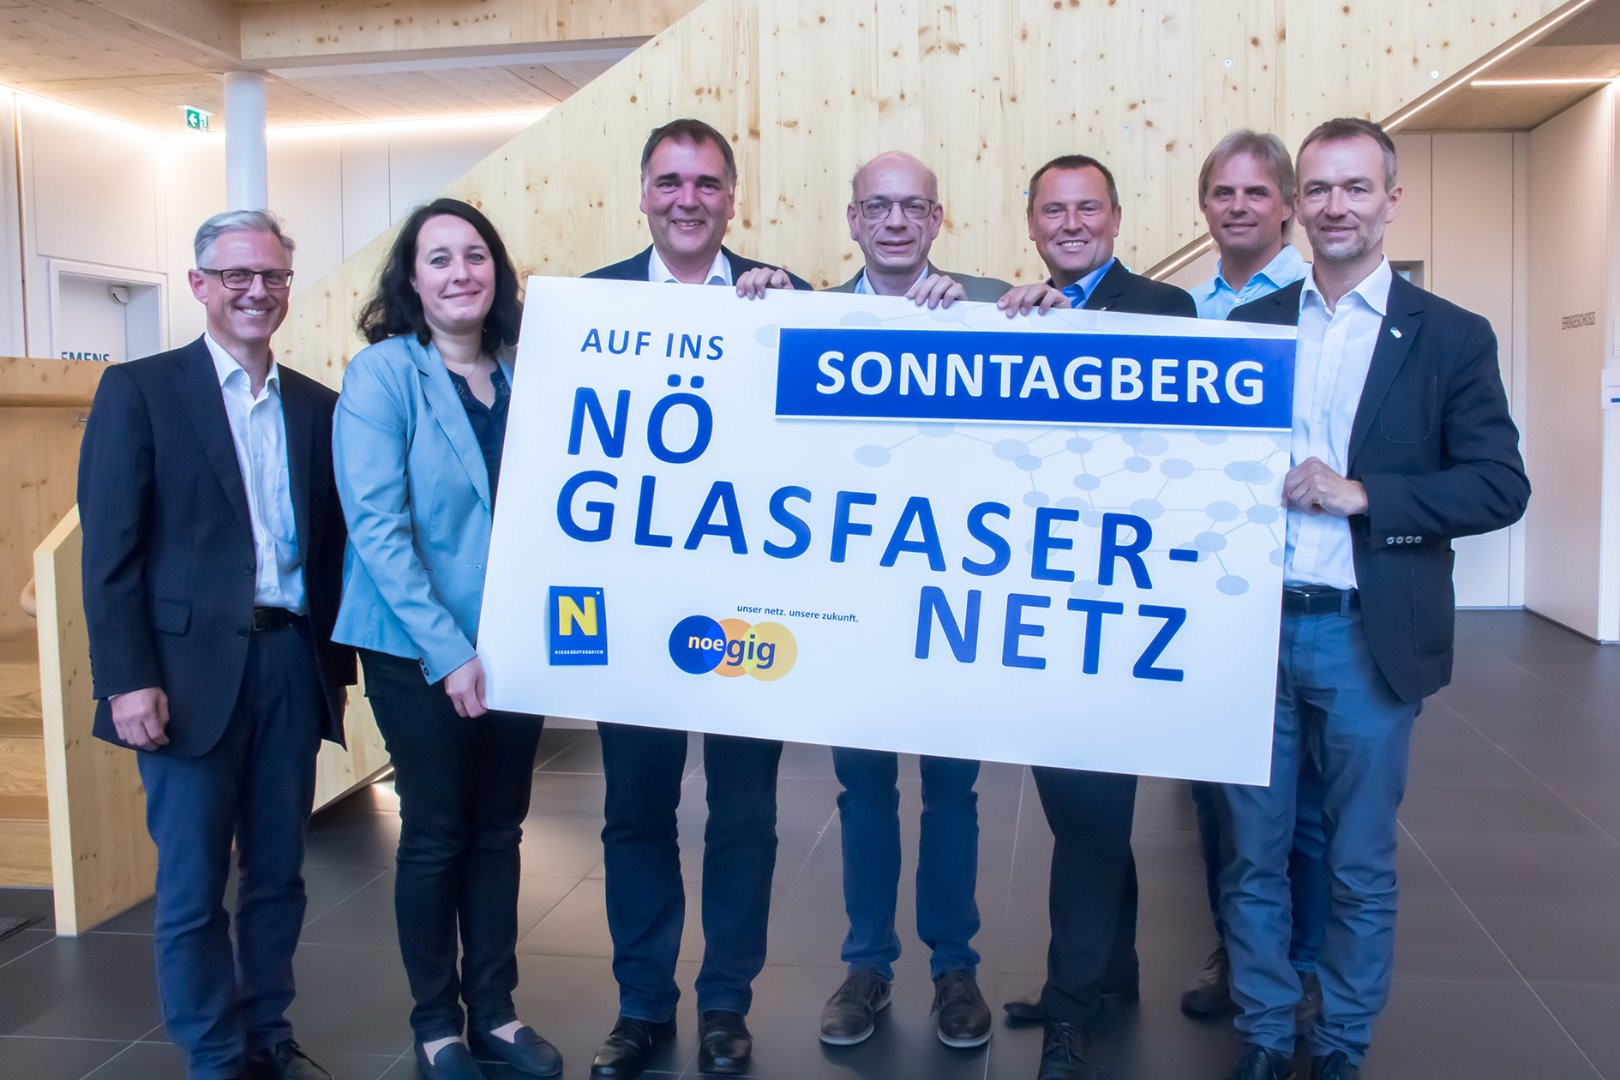 Sonntagberg_Pressefoto.jpg